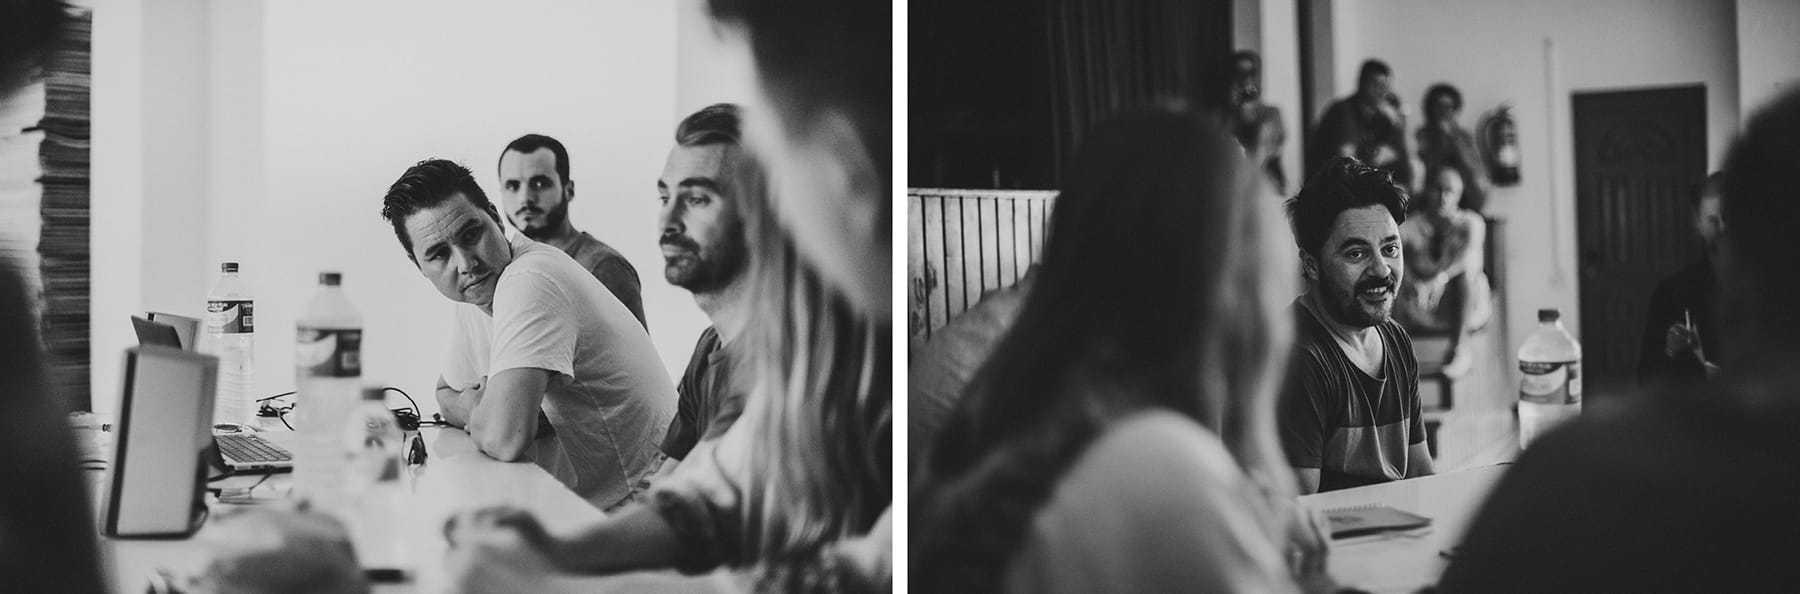 wolves_workshop_hilario_sanchez_fotografo_boda_españa_103